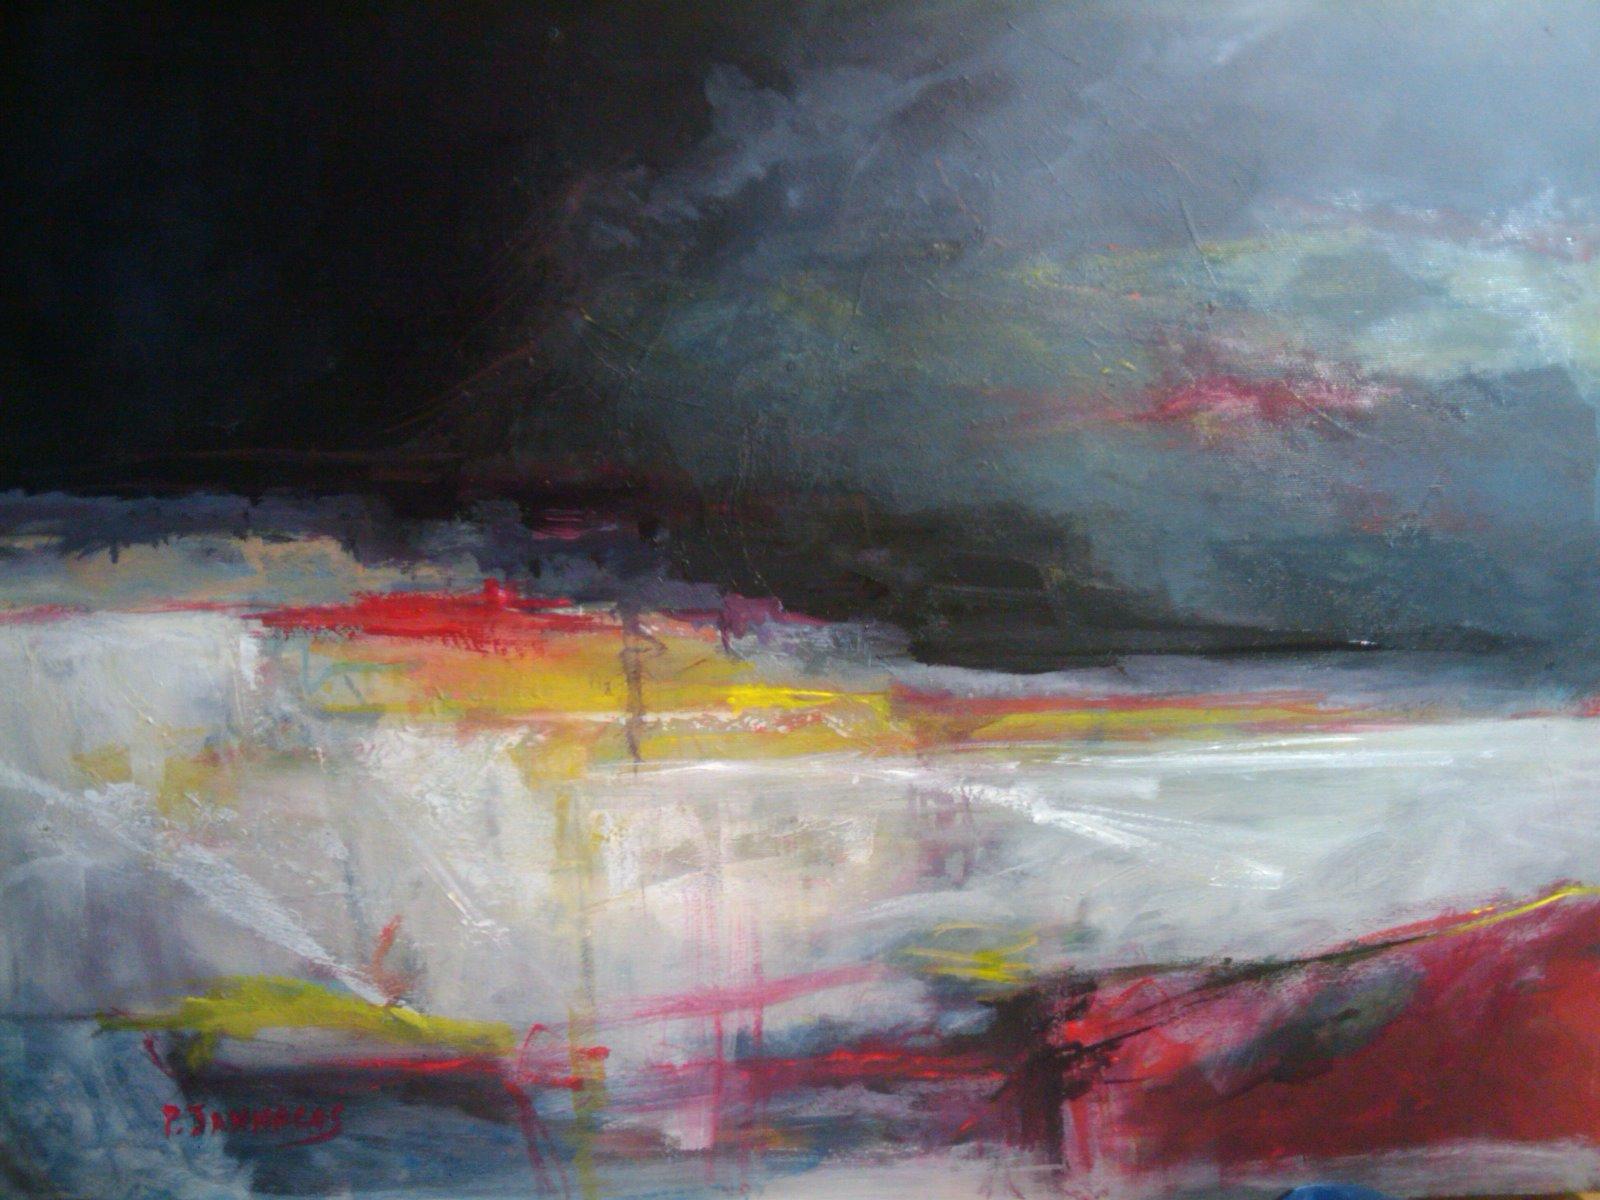 Amato P.JANNACOS e Nadia Di Meo ARTE: Arte contemporanea di P.Jannacos  CW58